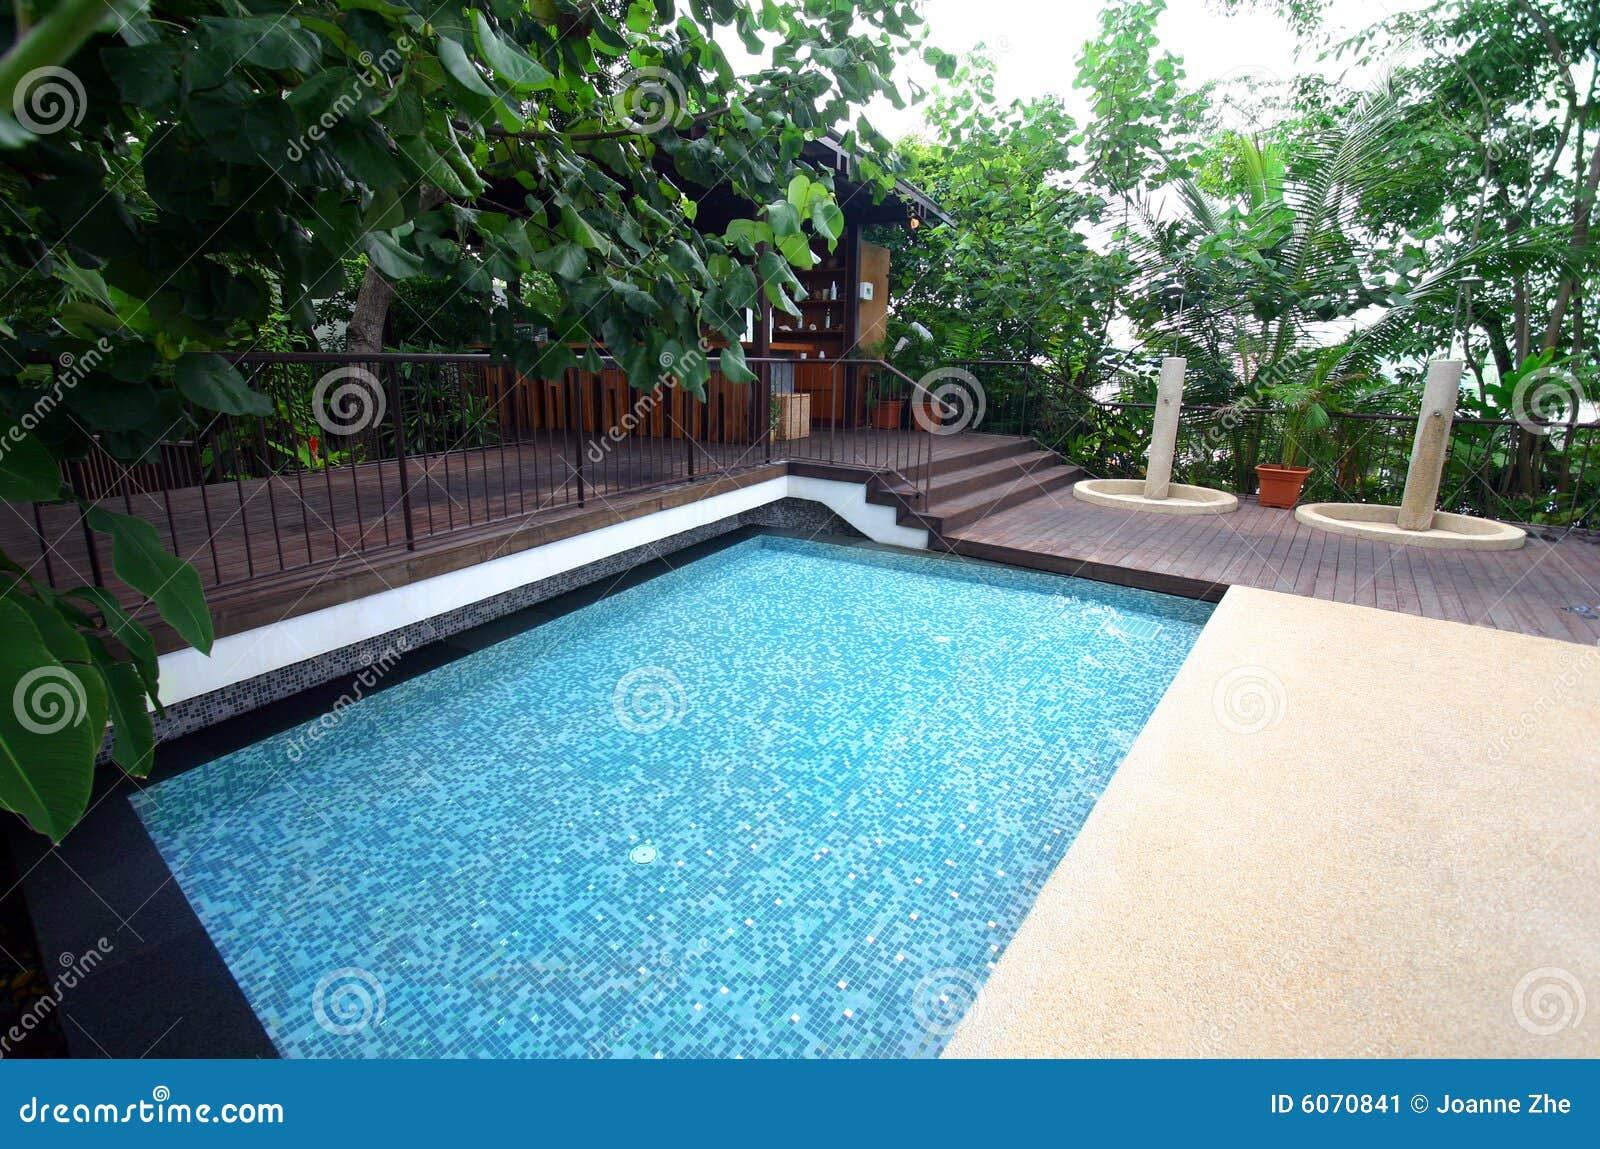 Hotel Resort Swimming Pool & Bar, Tropical Stock Image - Image ...